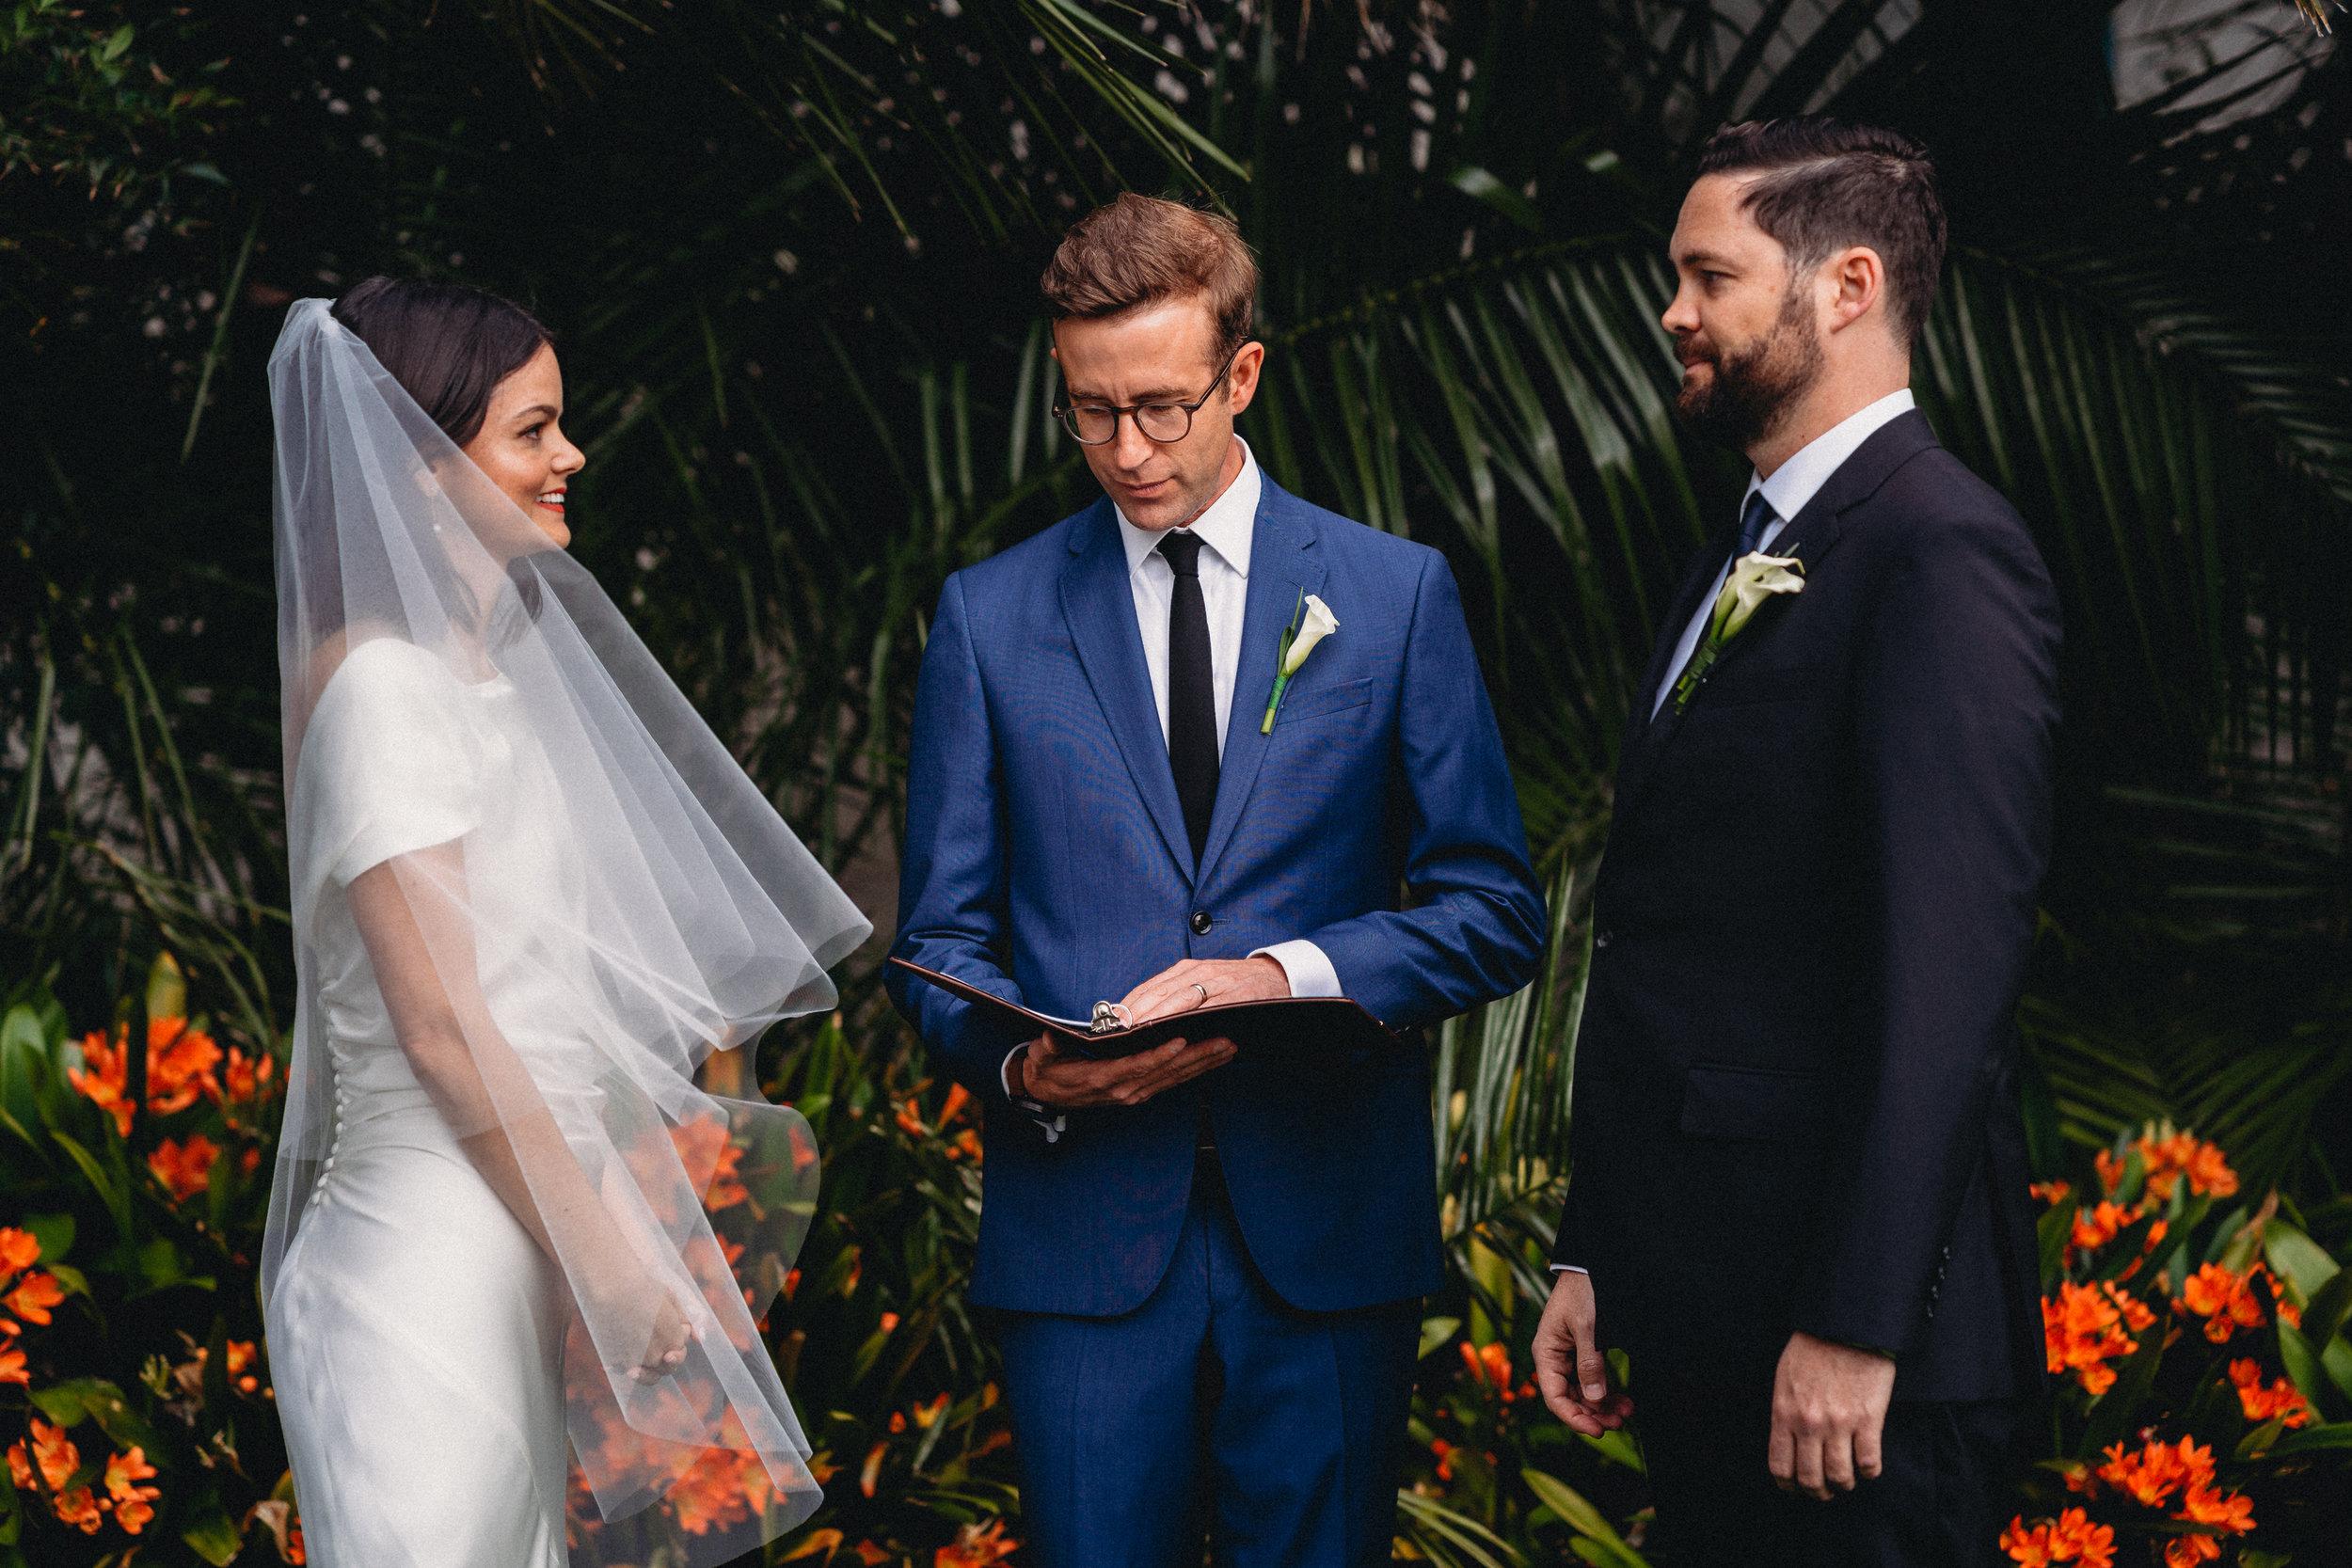 wedding-photography-santa-barbara-courthouse-rebeccaylasotras-47.jpg